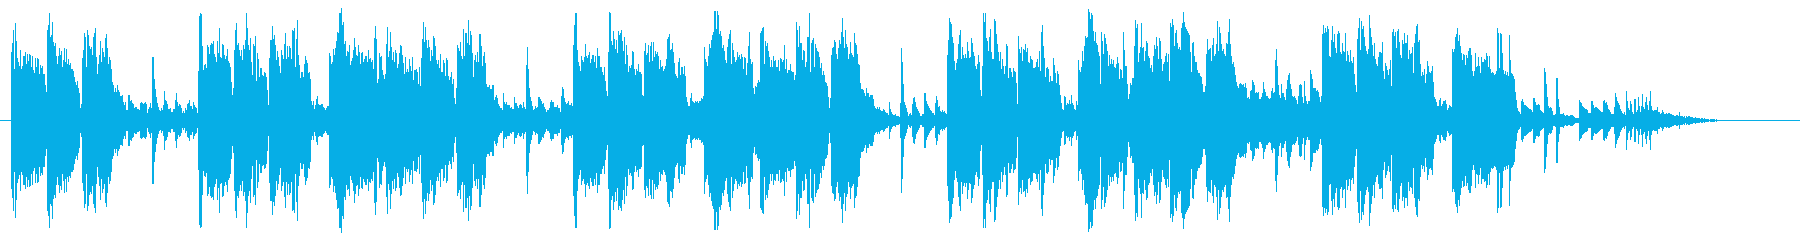 texture12の再生済みの波形